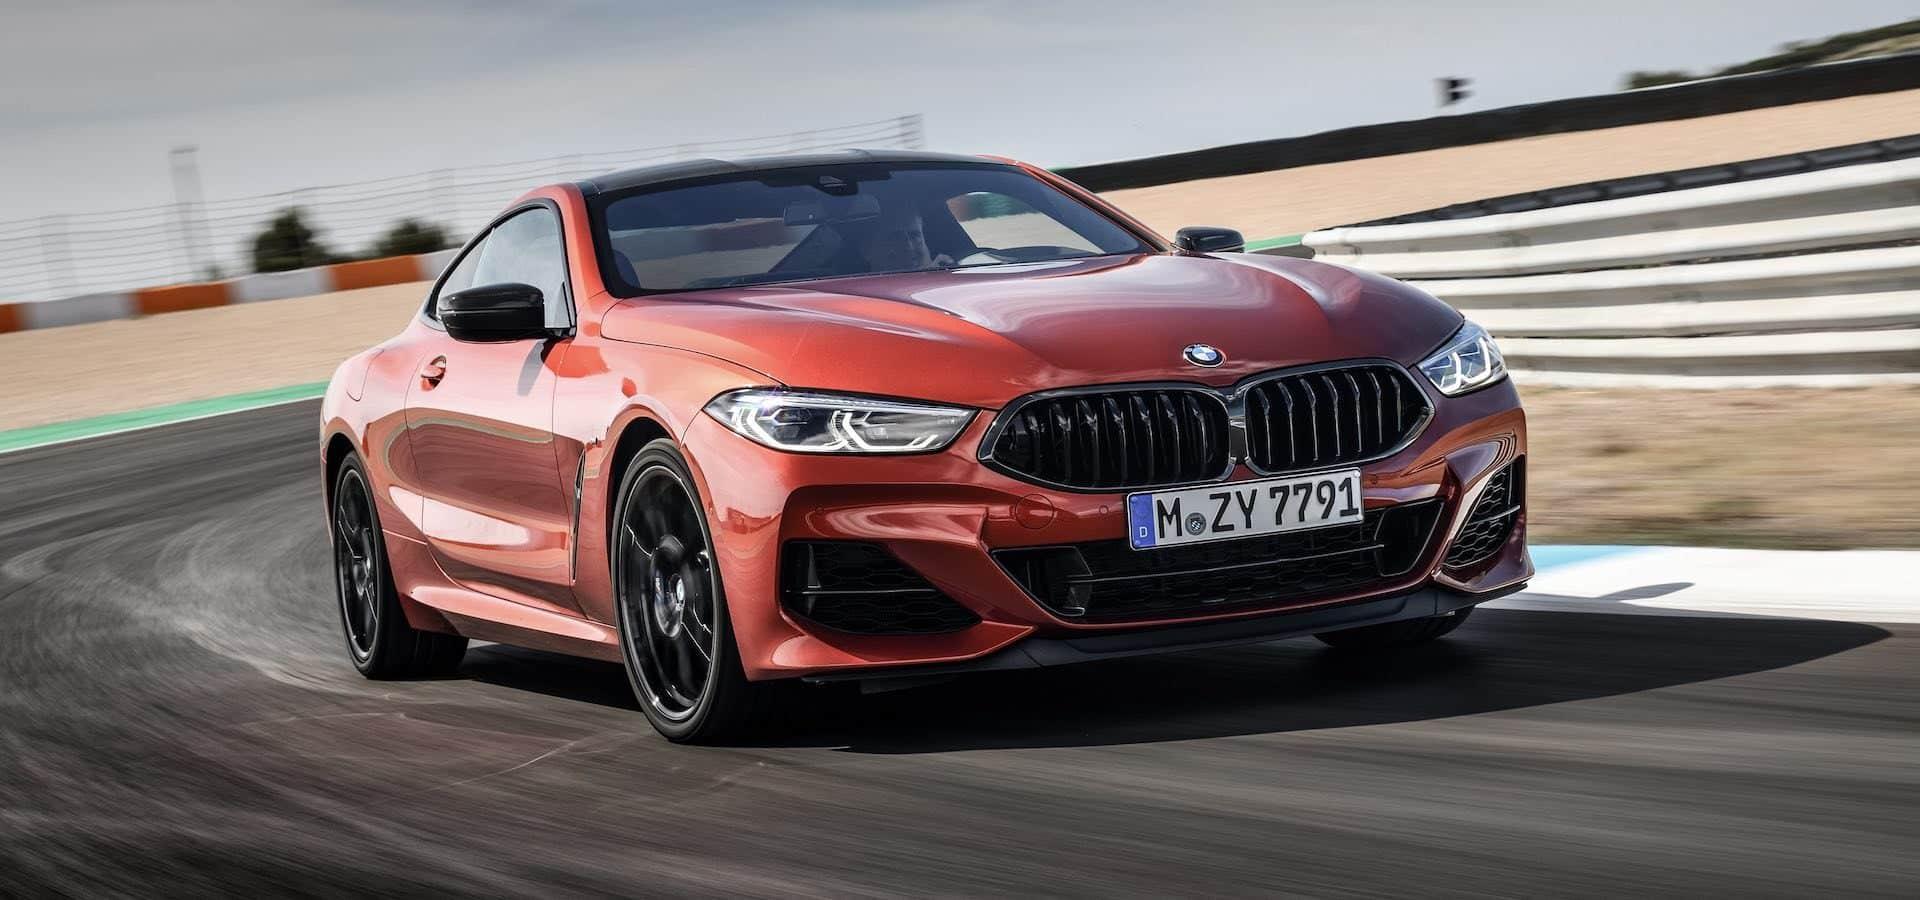 BMW 8 Series test drive wallpaper 2018 | The Car Expert